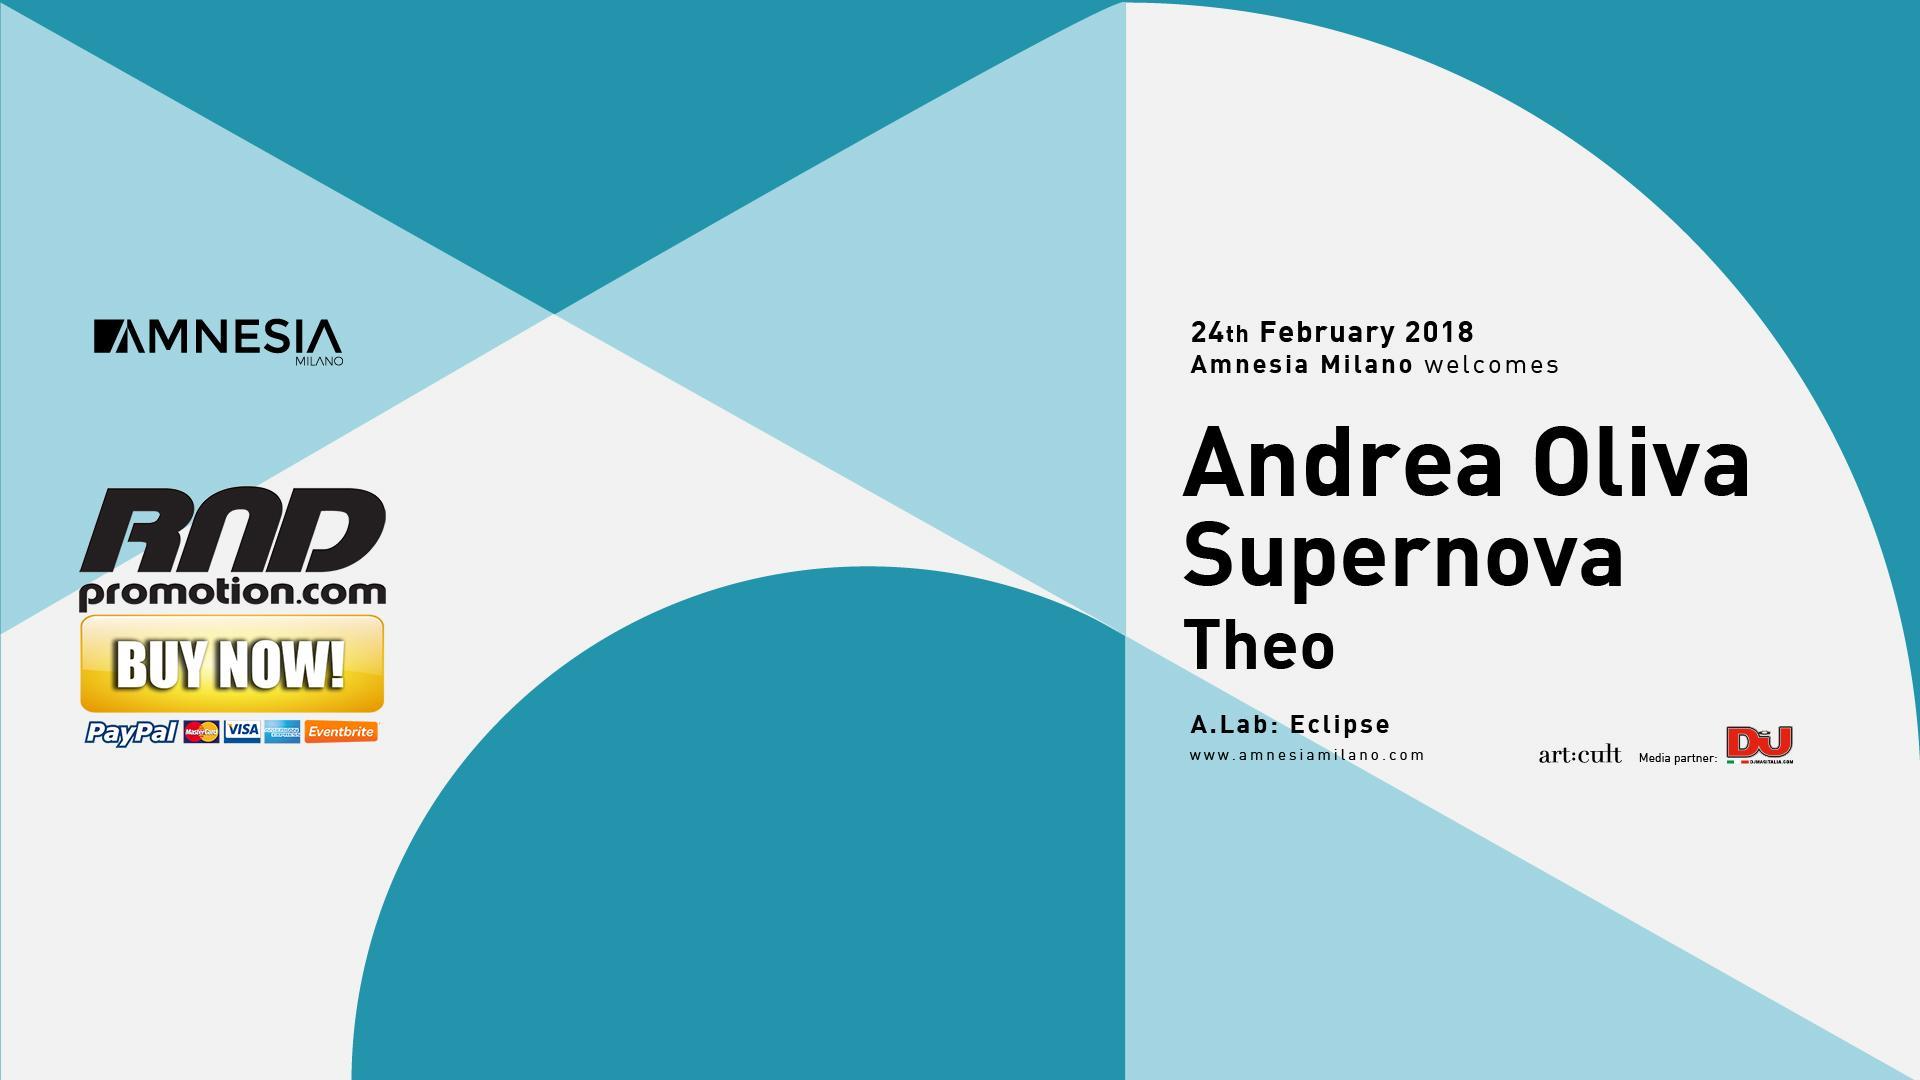 Andrea Oliva, Supernova, Theo at Amnesia Mila